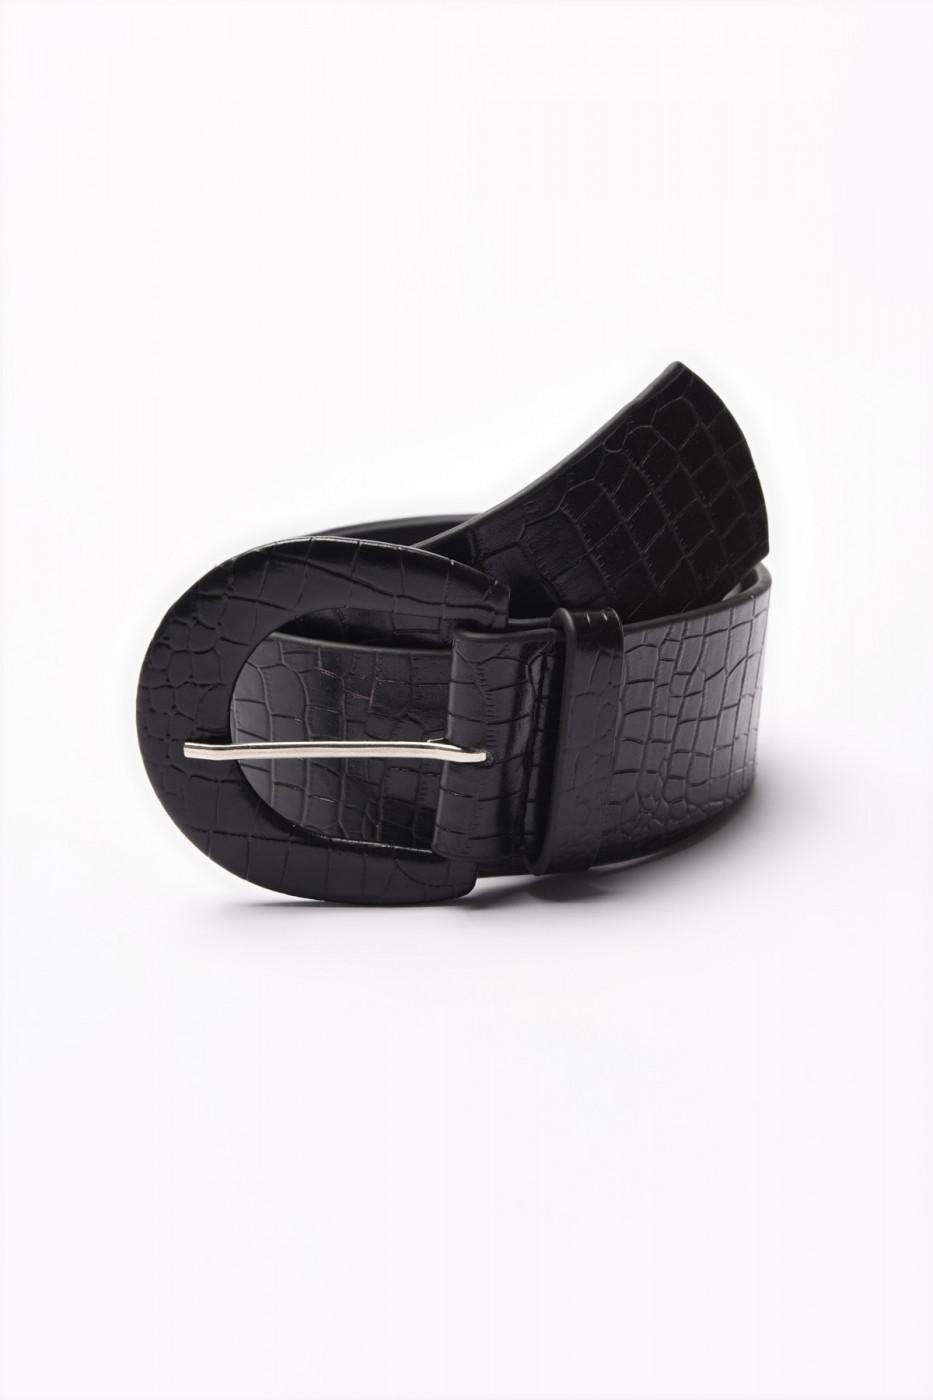 Trendyol Black Kroko Leather Belt